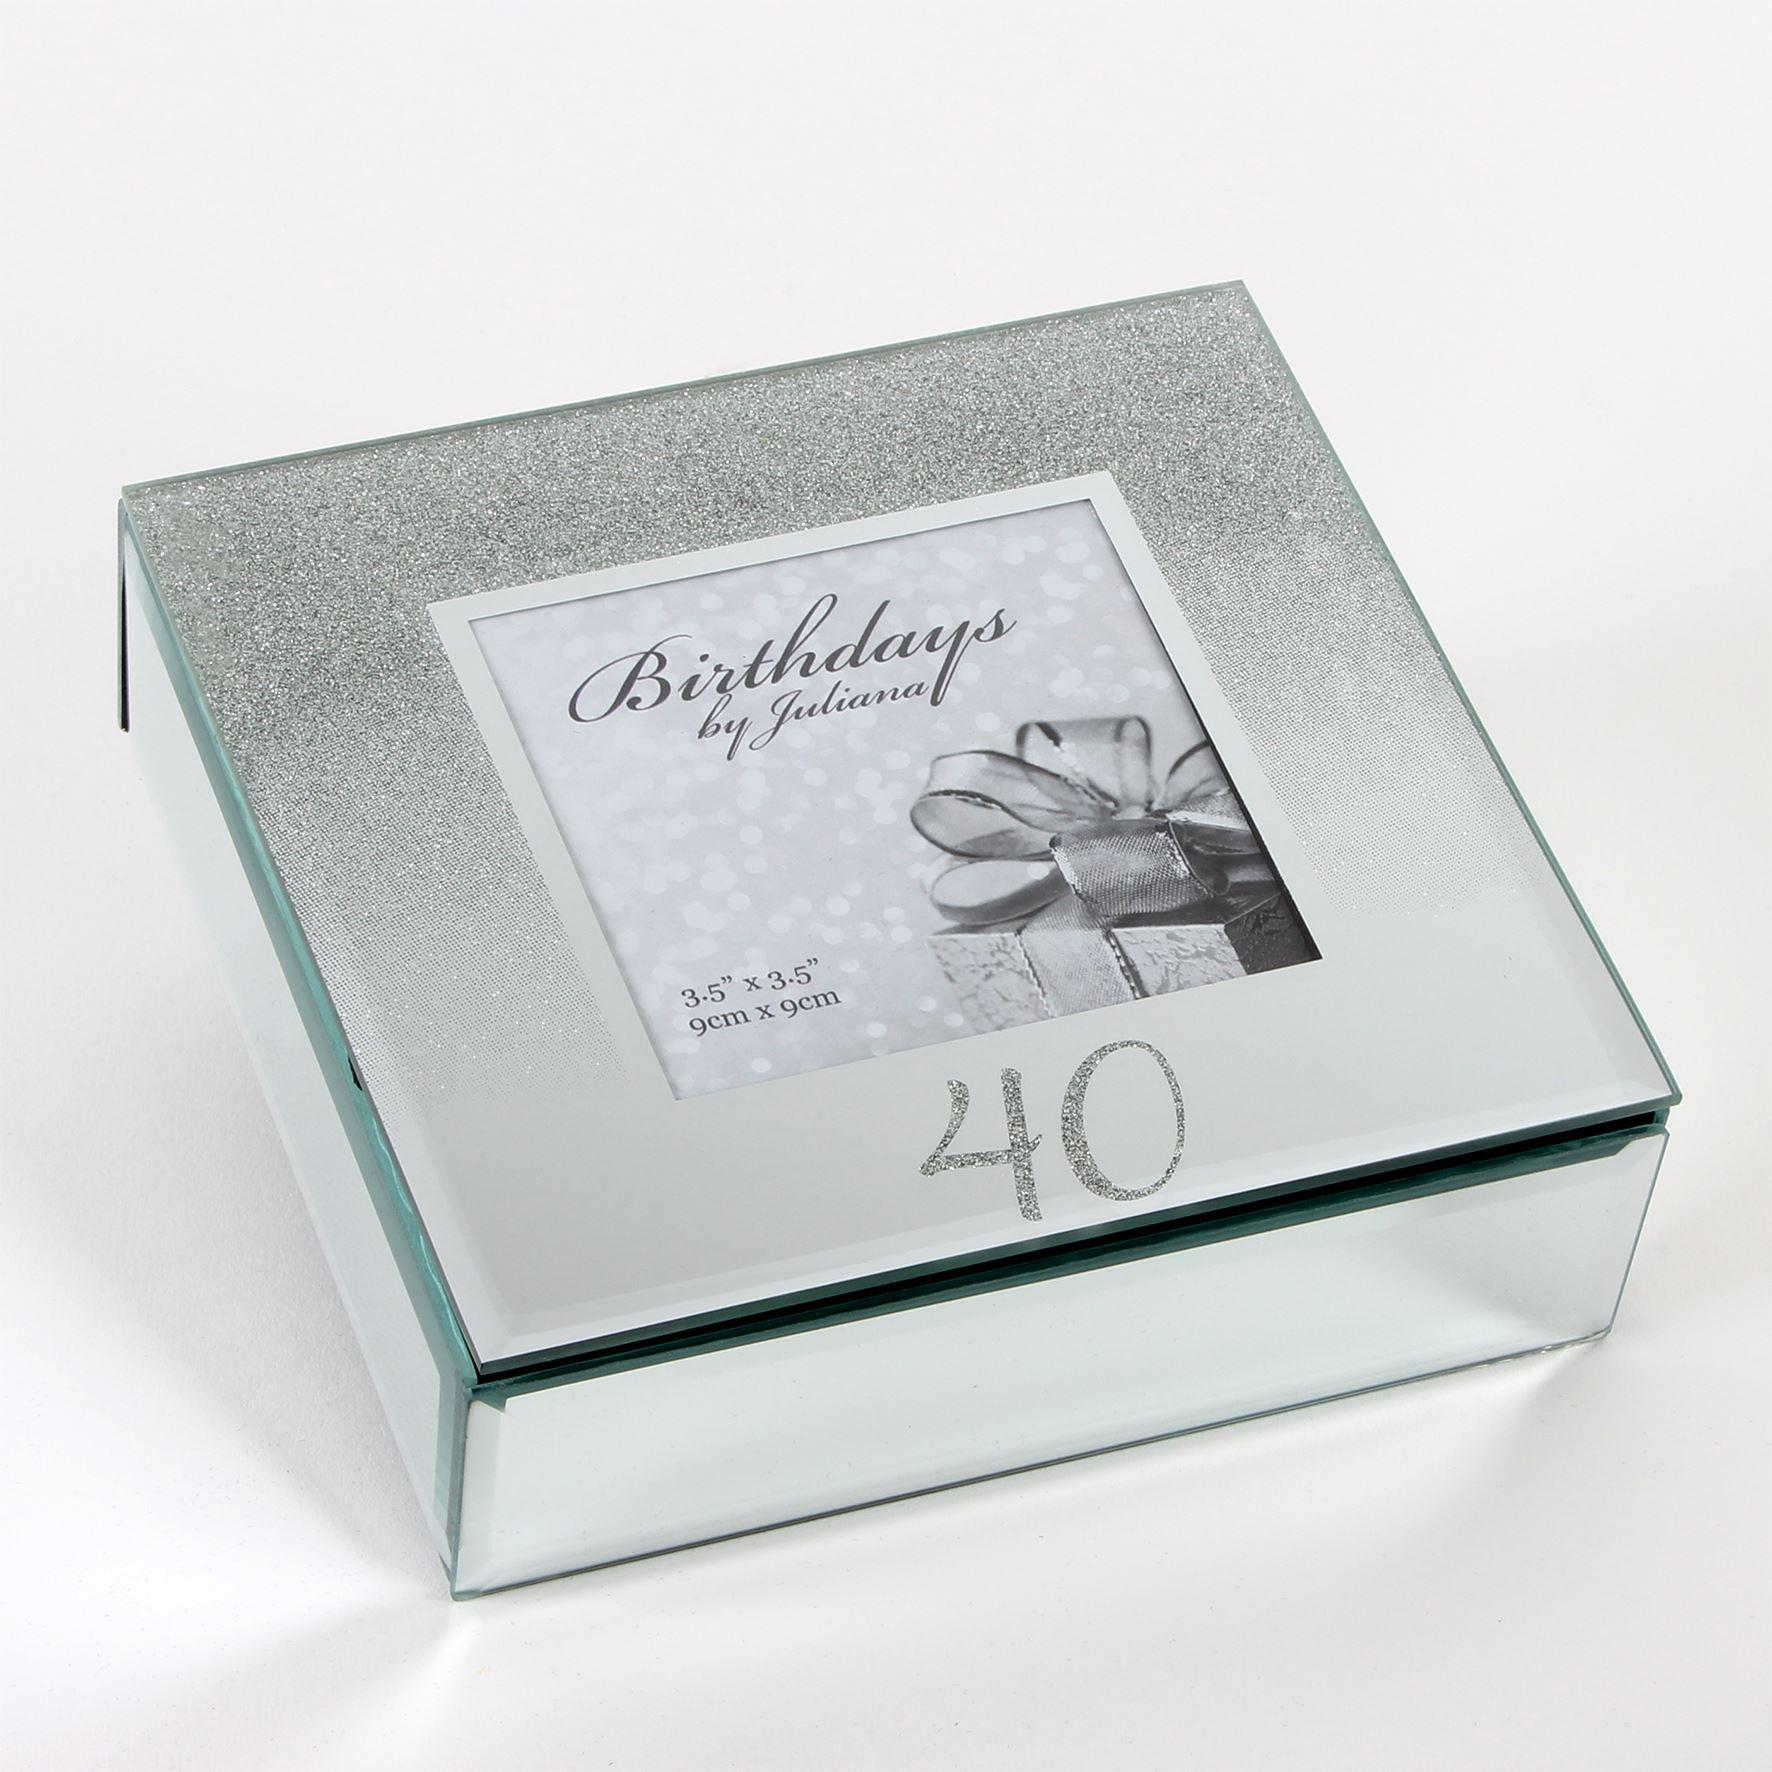 Birthdays By Juliana Glitter Mirror Trinket Box - 40Th